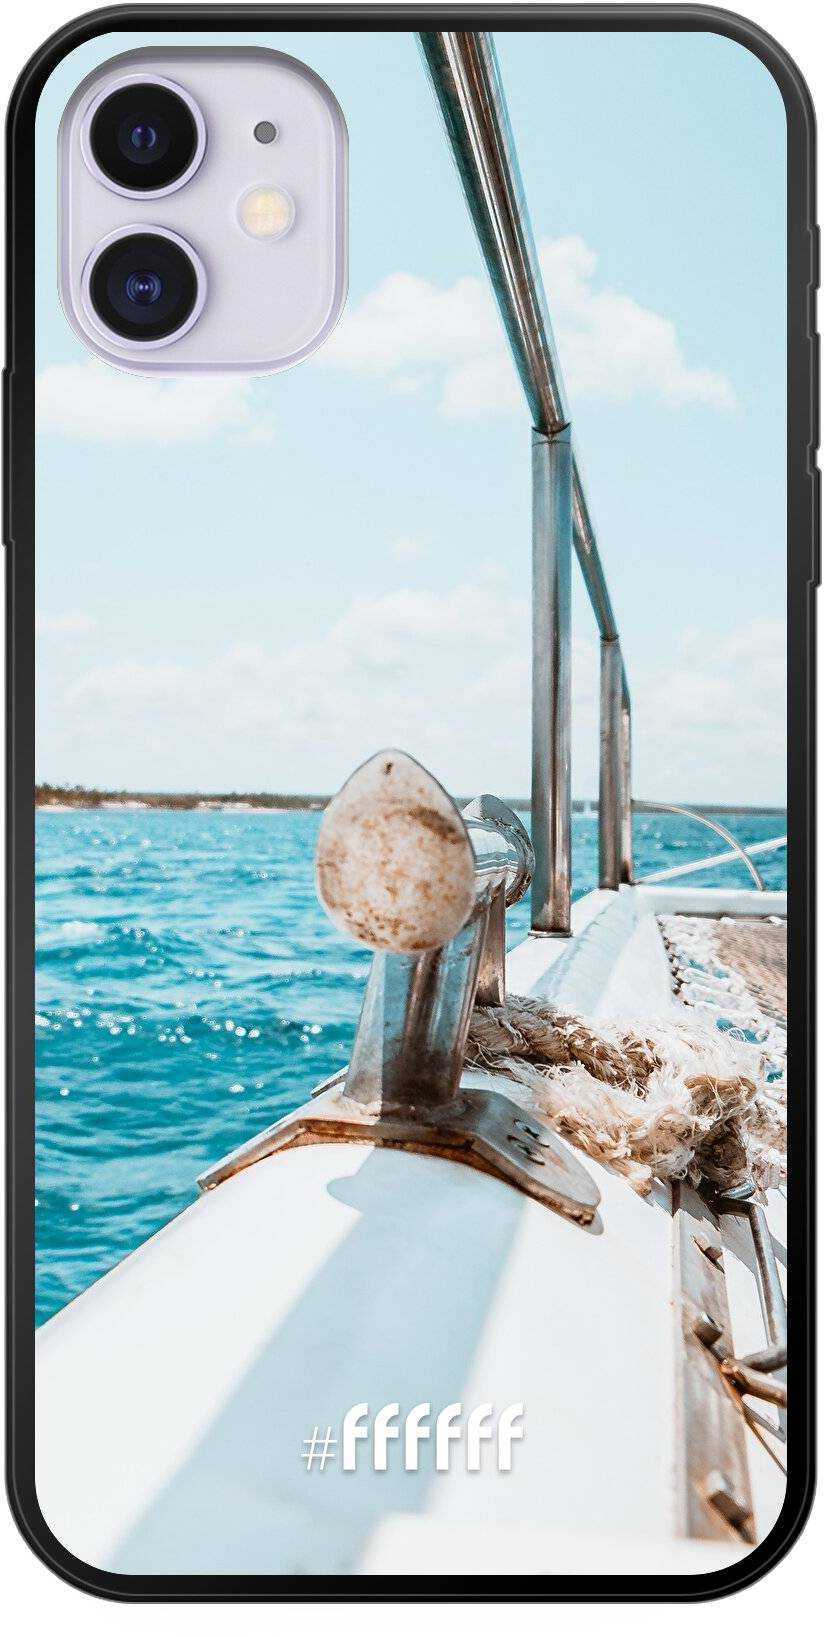 Sailing iPhone 11